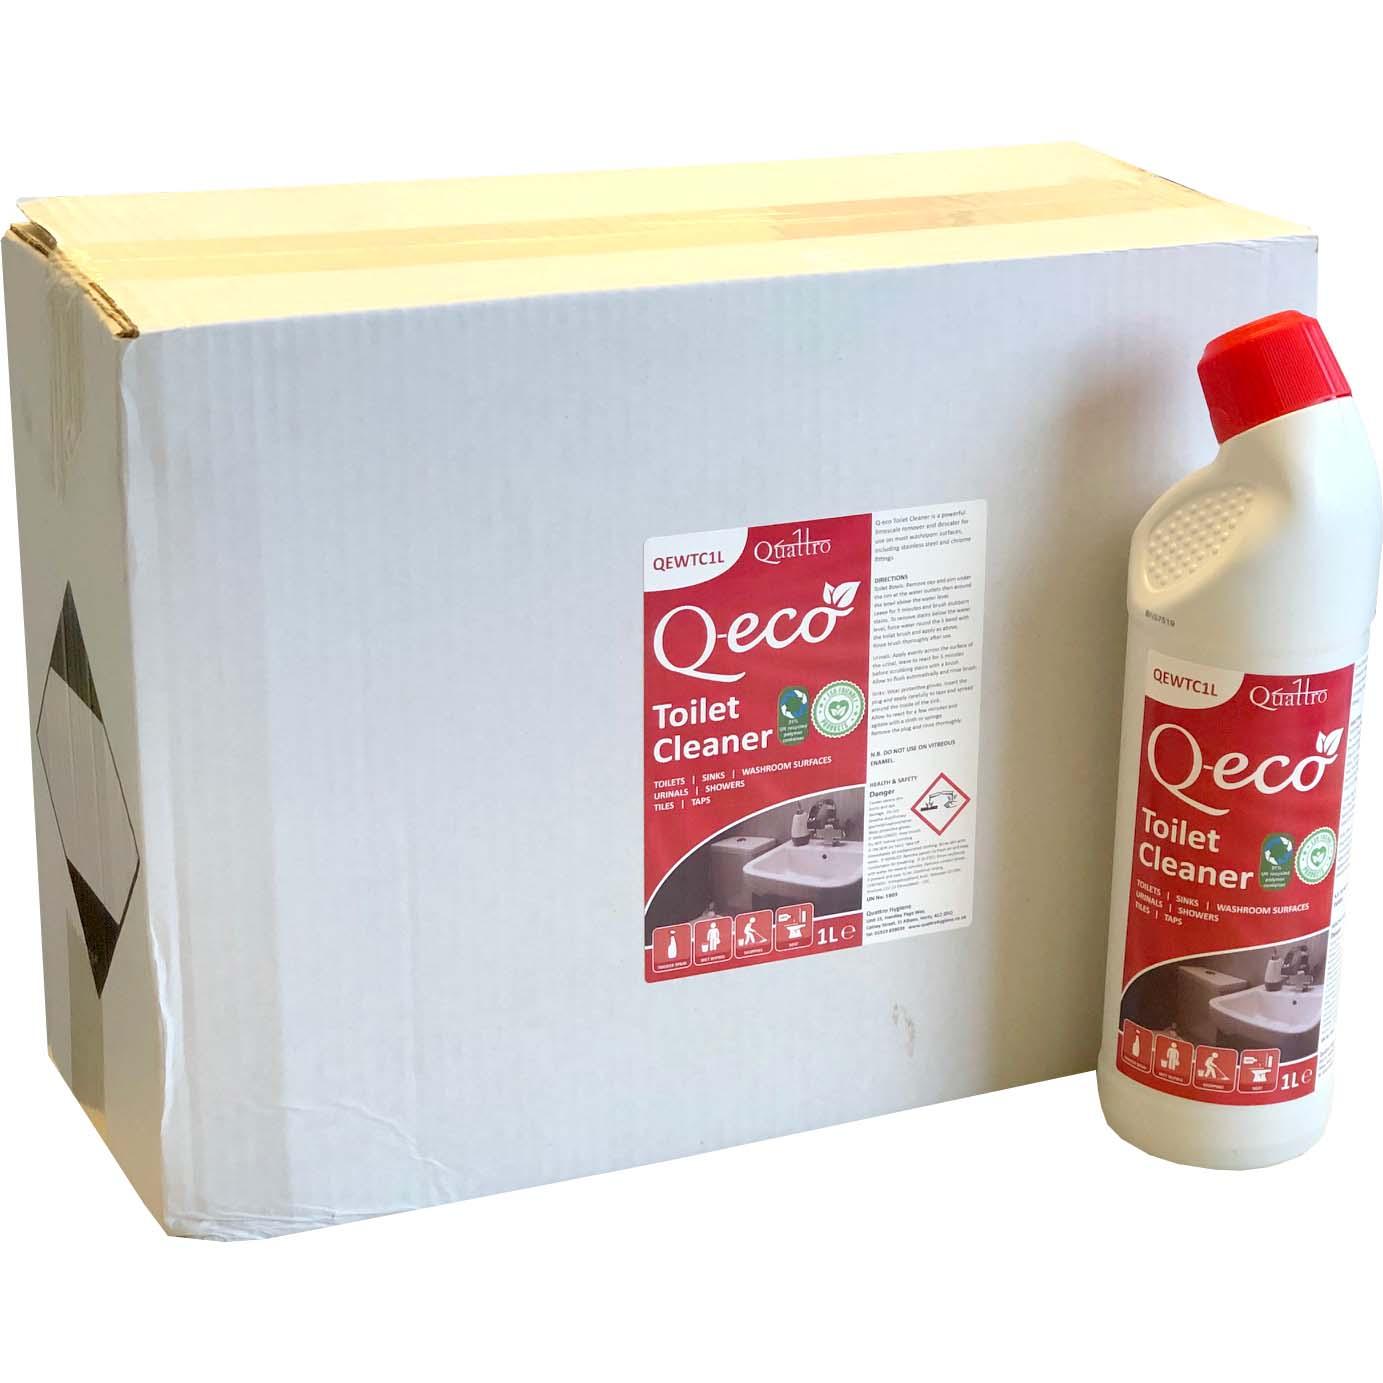 Quattro-Q-Eco-4-way-Toilet-Cleaner-10x1litre